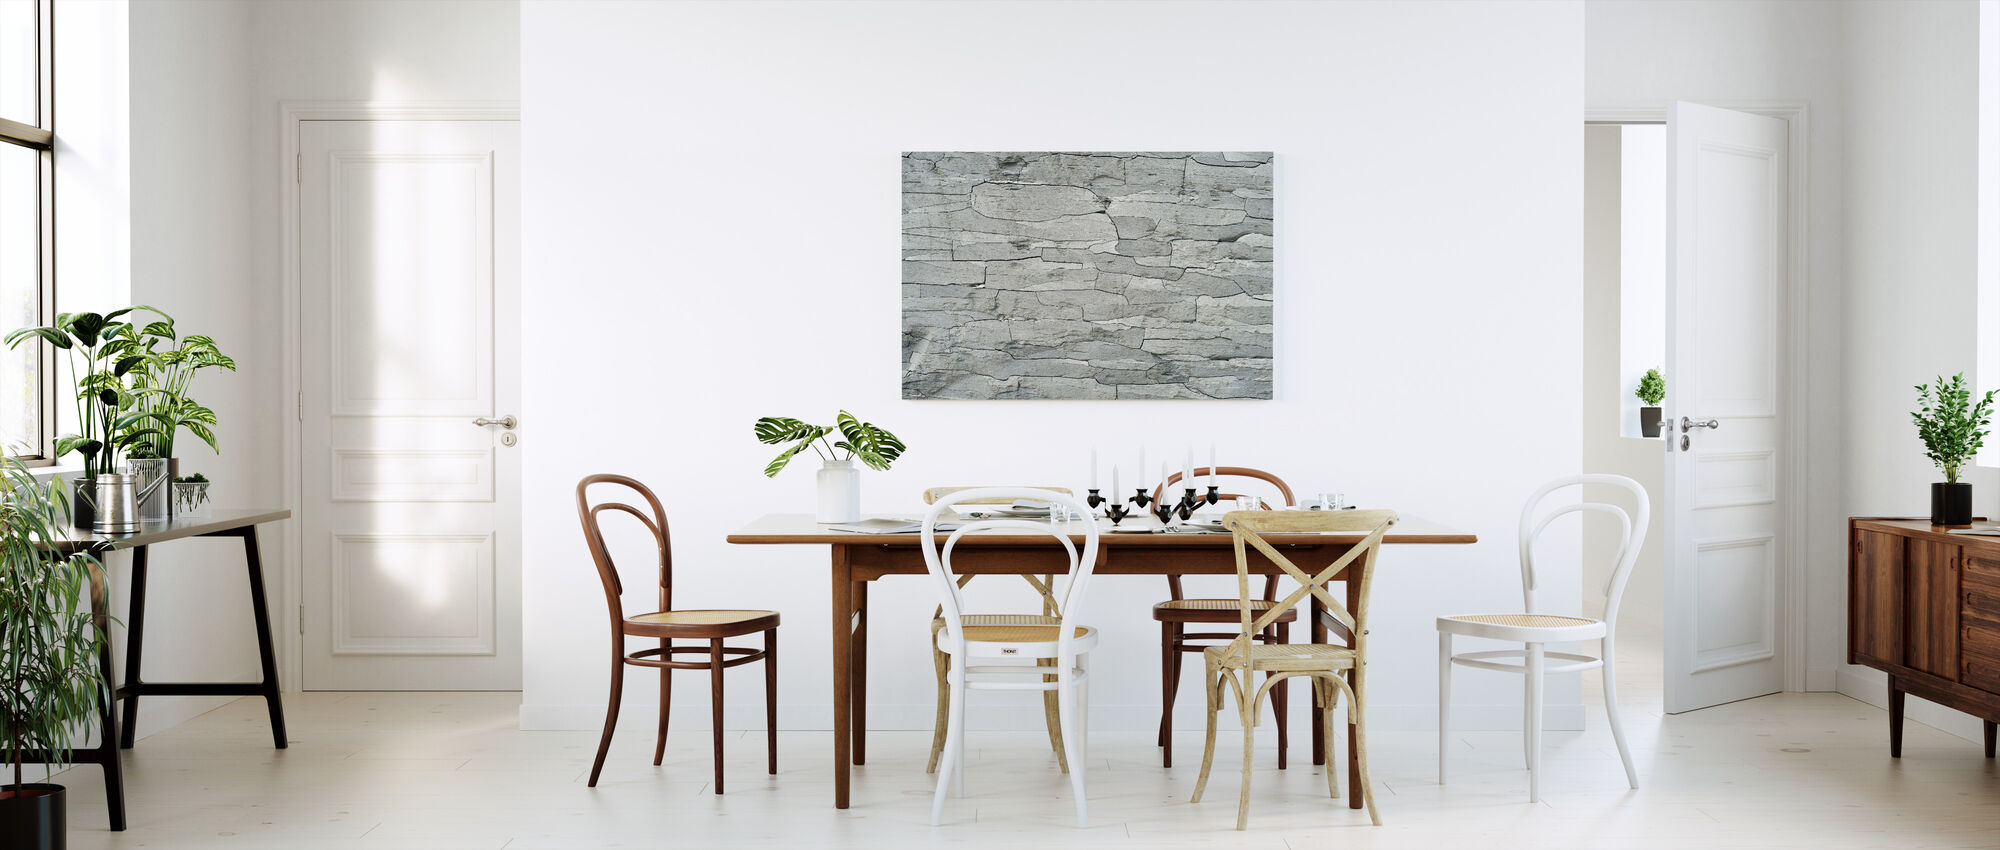 Grijze Steen Patroon - Canvas print - Keuken